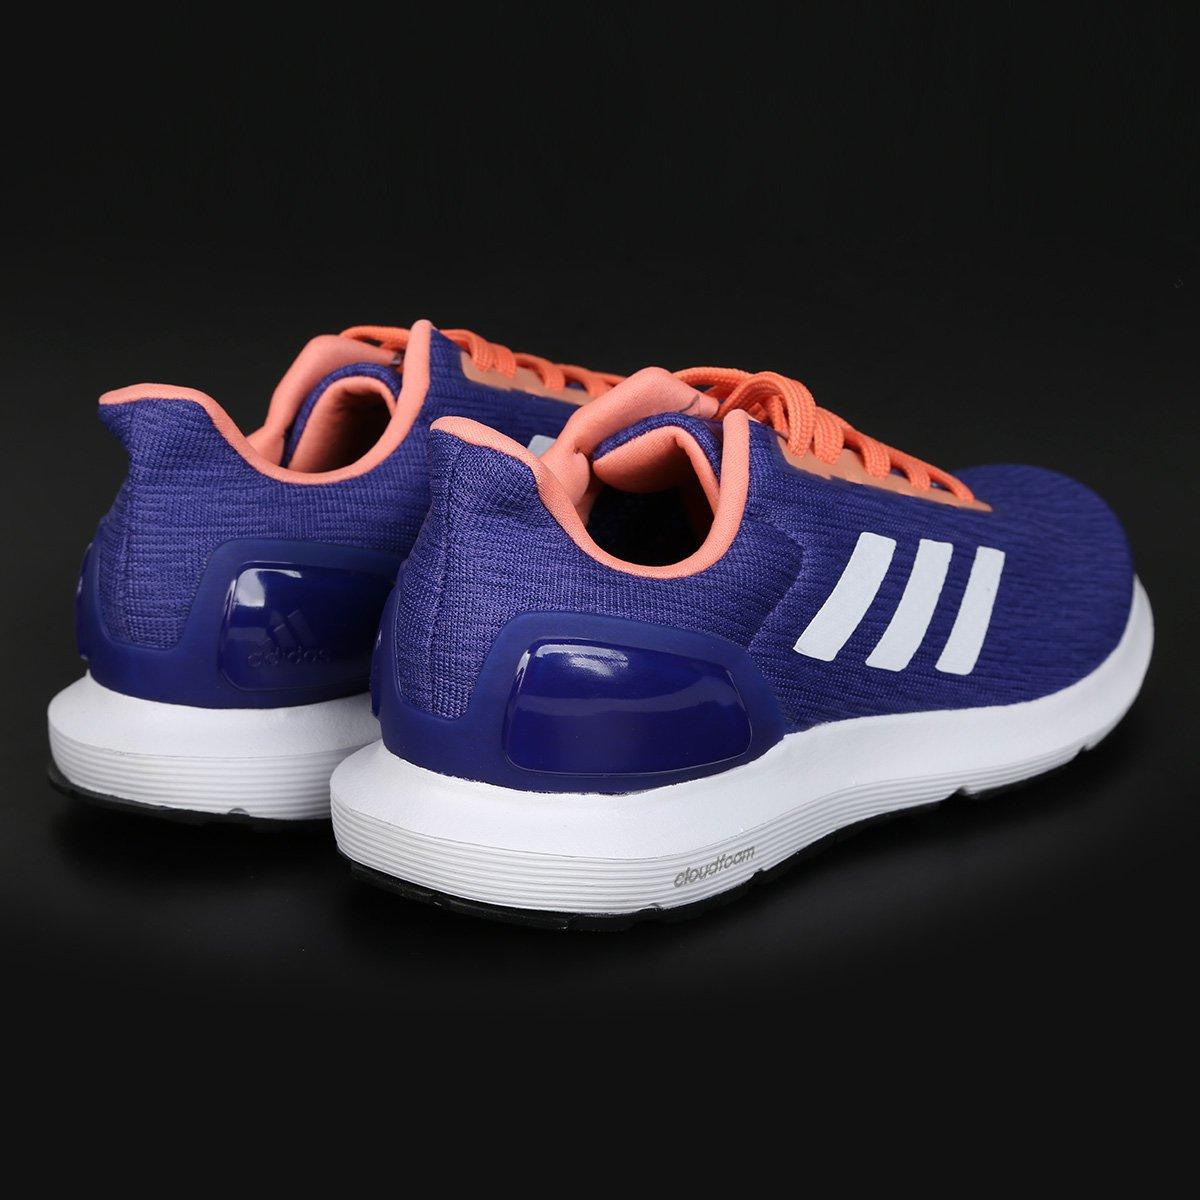 Tênis Adidas Cosmic 2 Feminino - Compre Agora  3eef26c470879